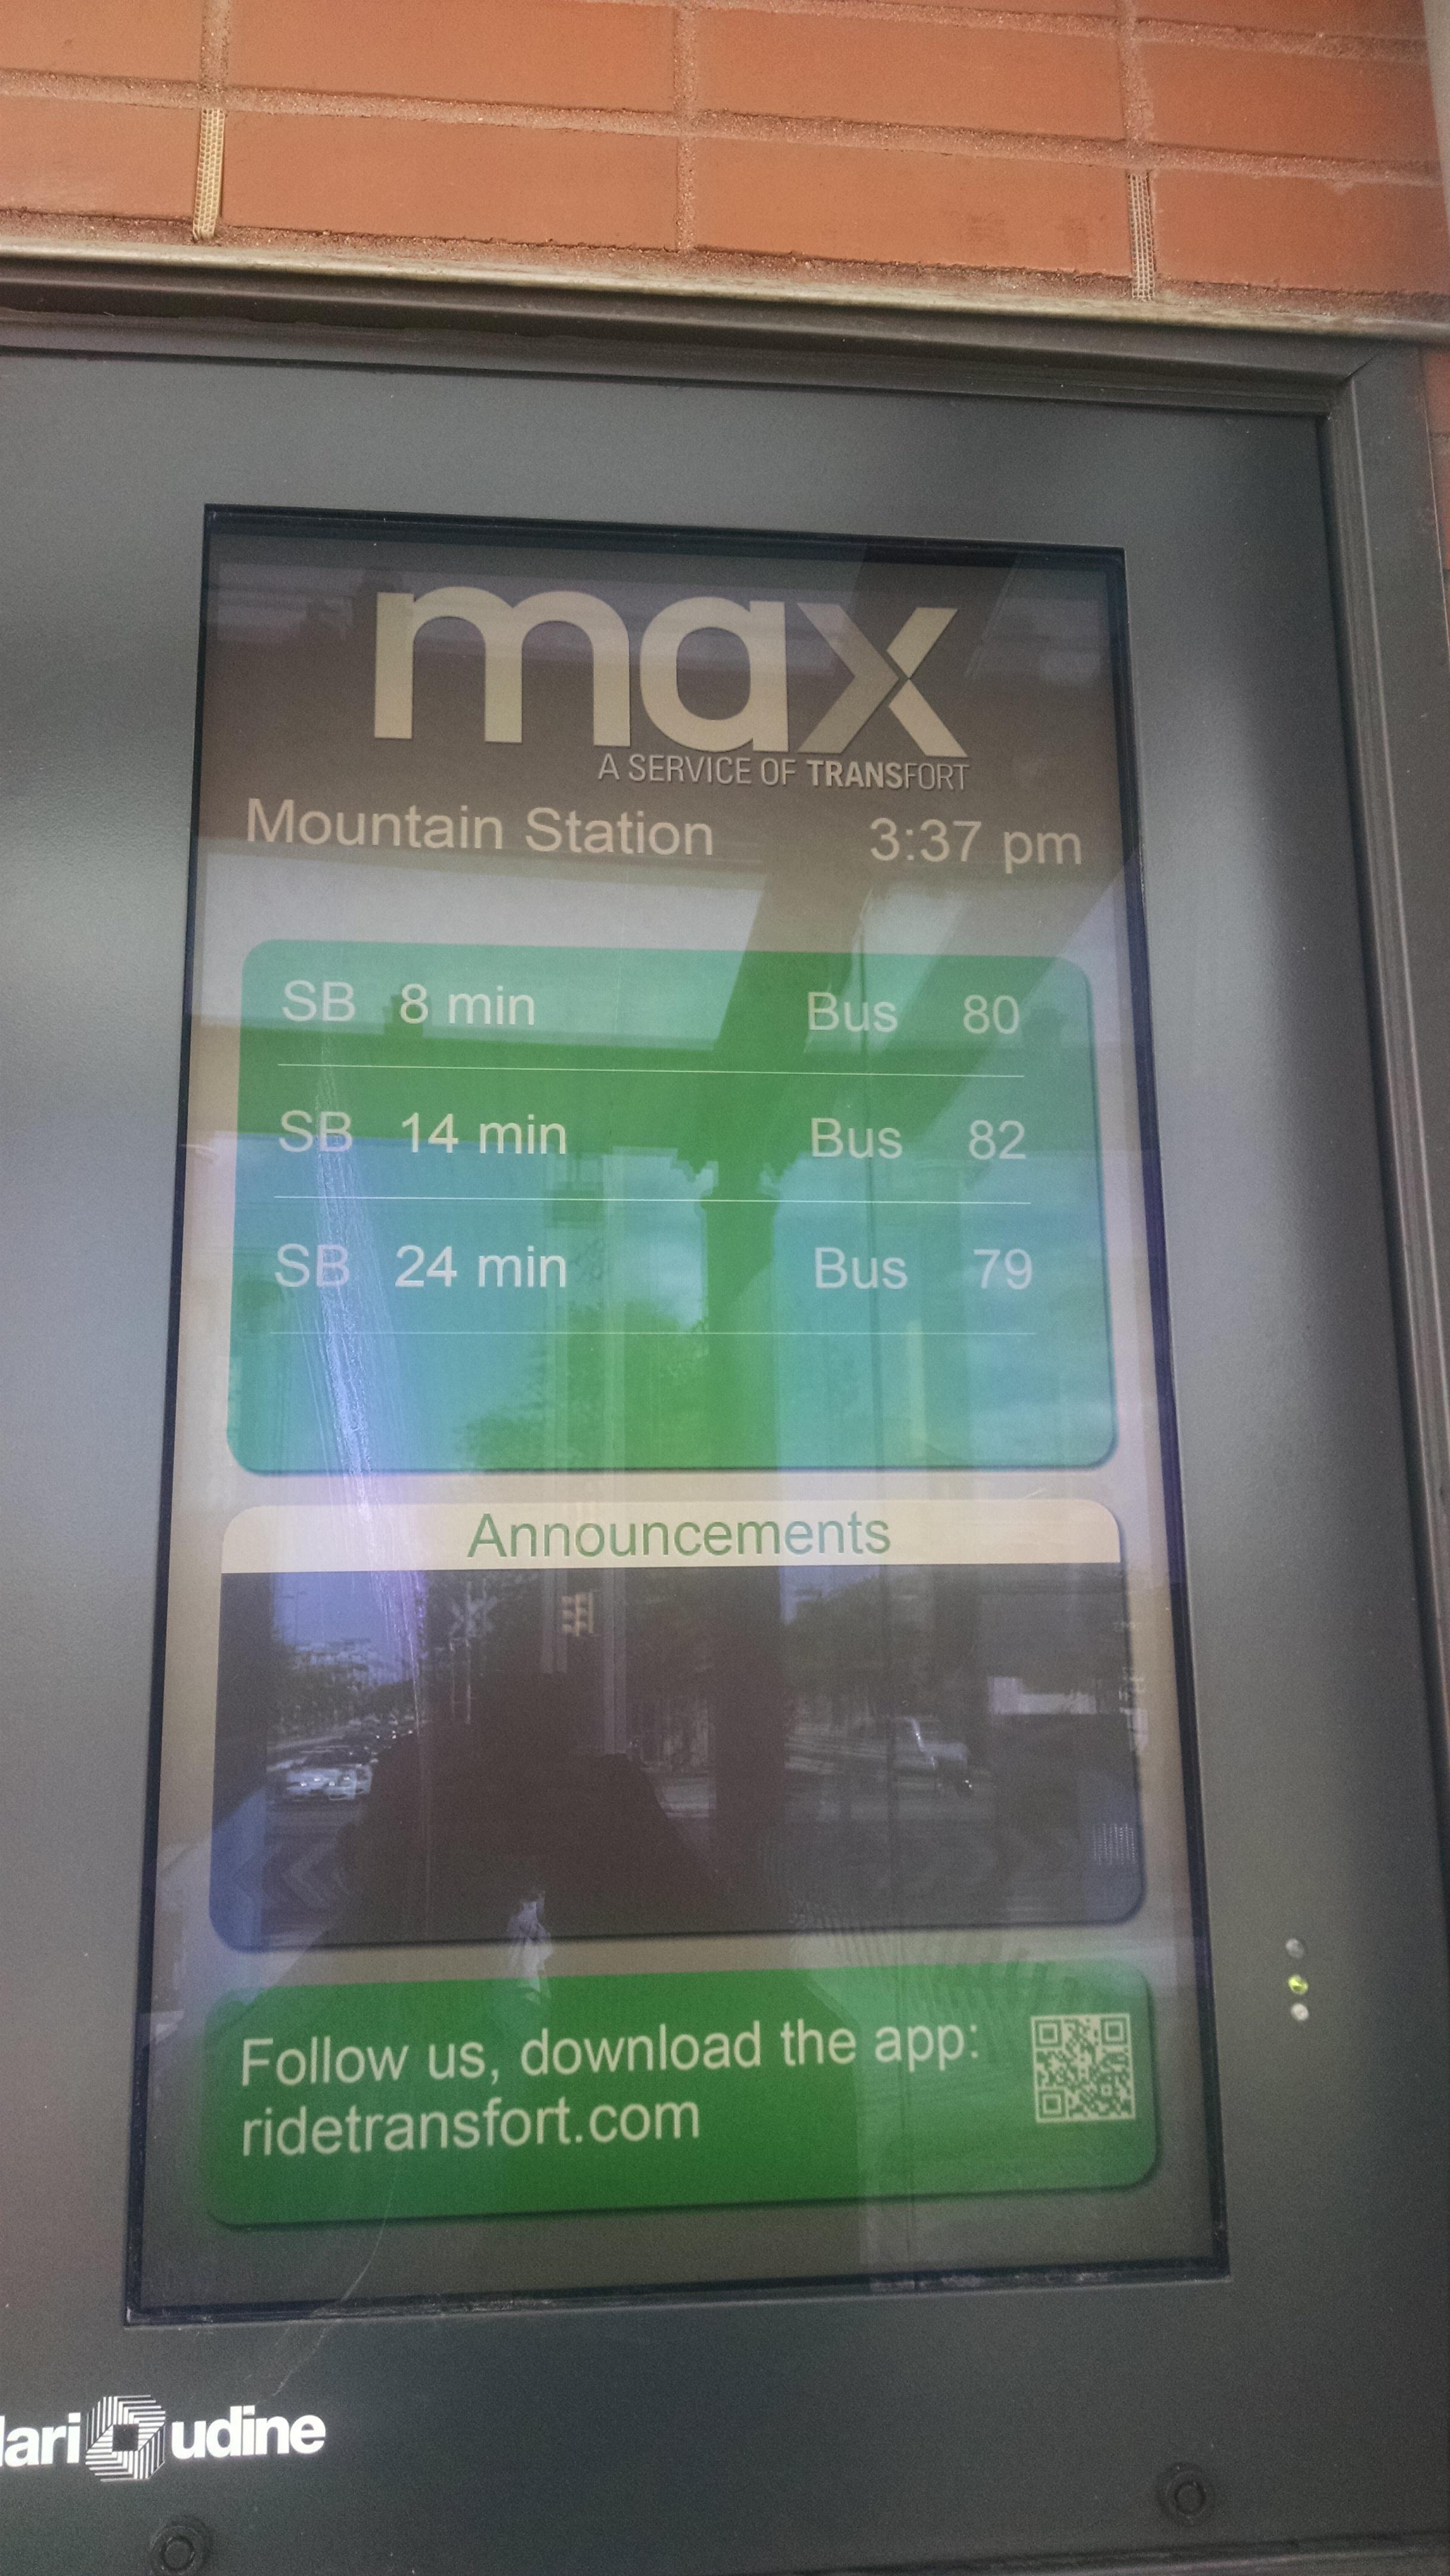 MAX schedule display.jpg